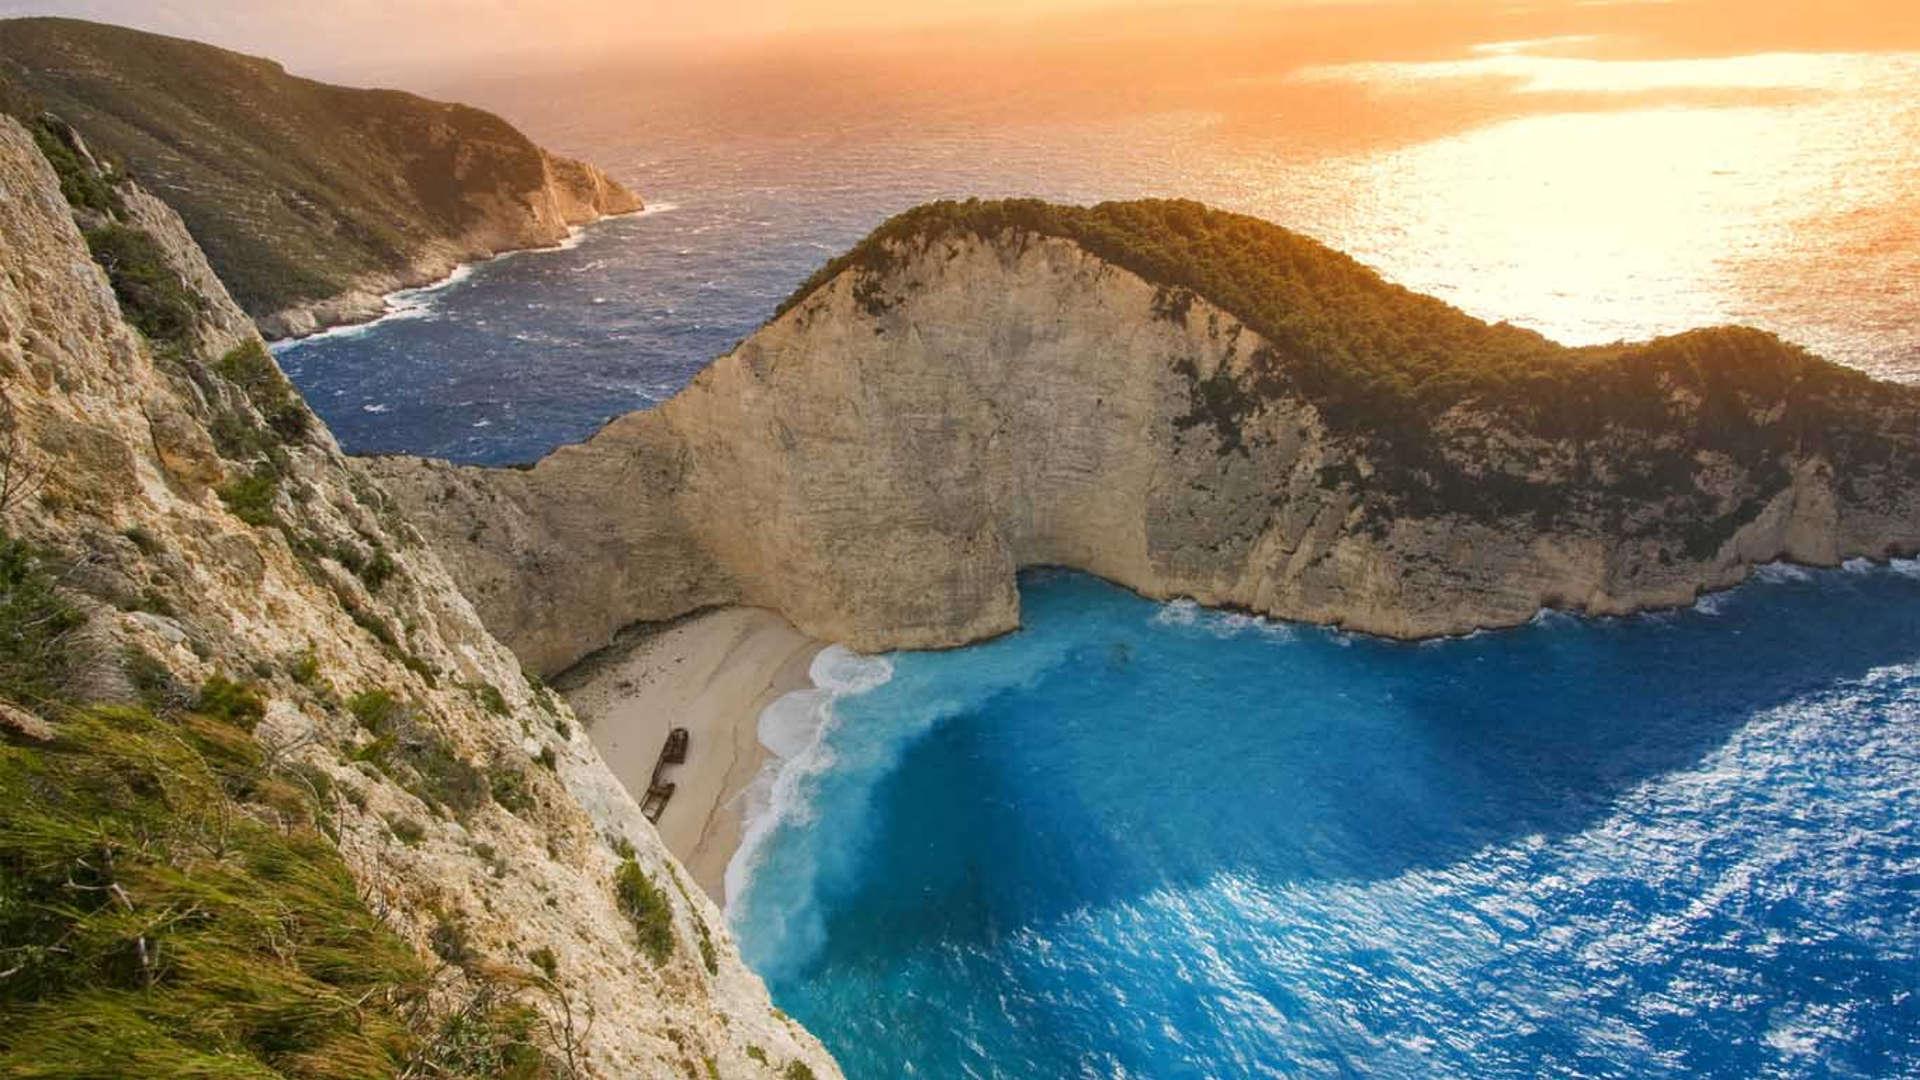 http://villacalma.gr/wp-content/uploads/2016/05/villa_calma_private_boat_trip.jpeg